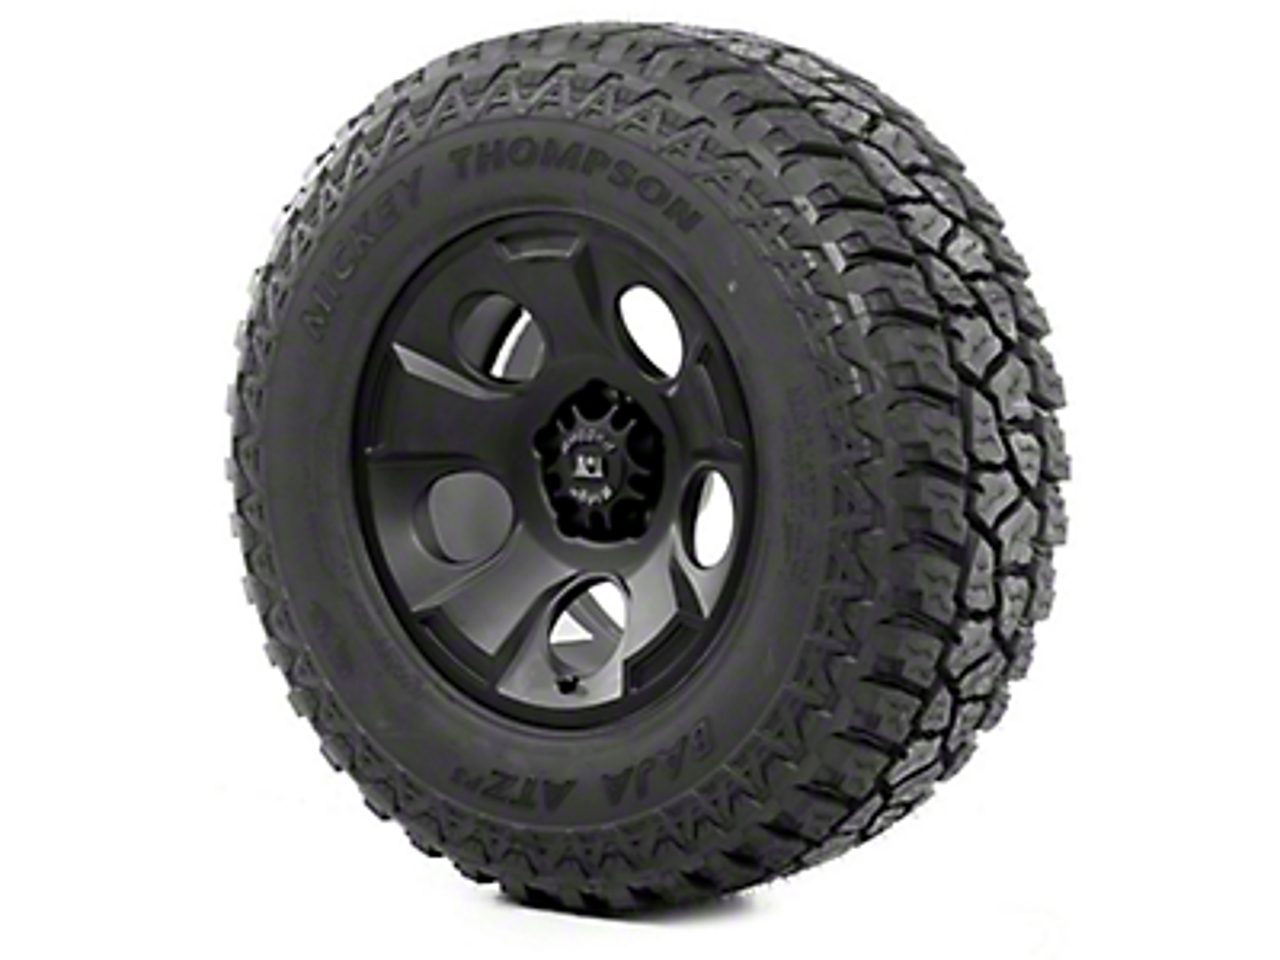 Rugged Ridge Drakon Wheel 17x9 Black Satin and Mickey Thompson ATZ P3 315/70R17 Tire (13-18 Wrangler JK; 2018 Wrangler JL)